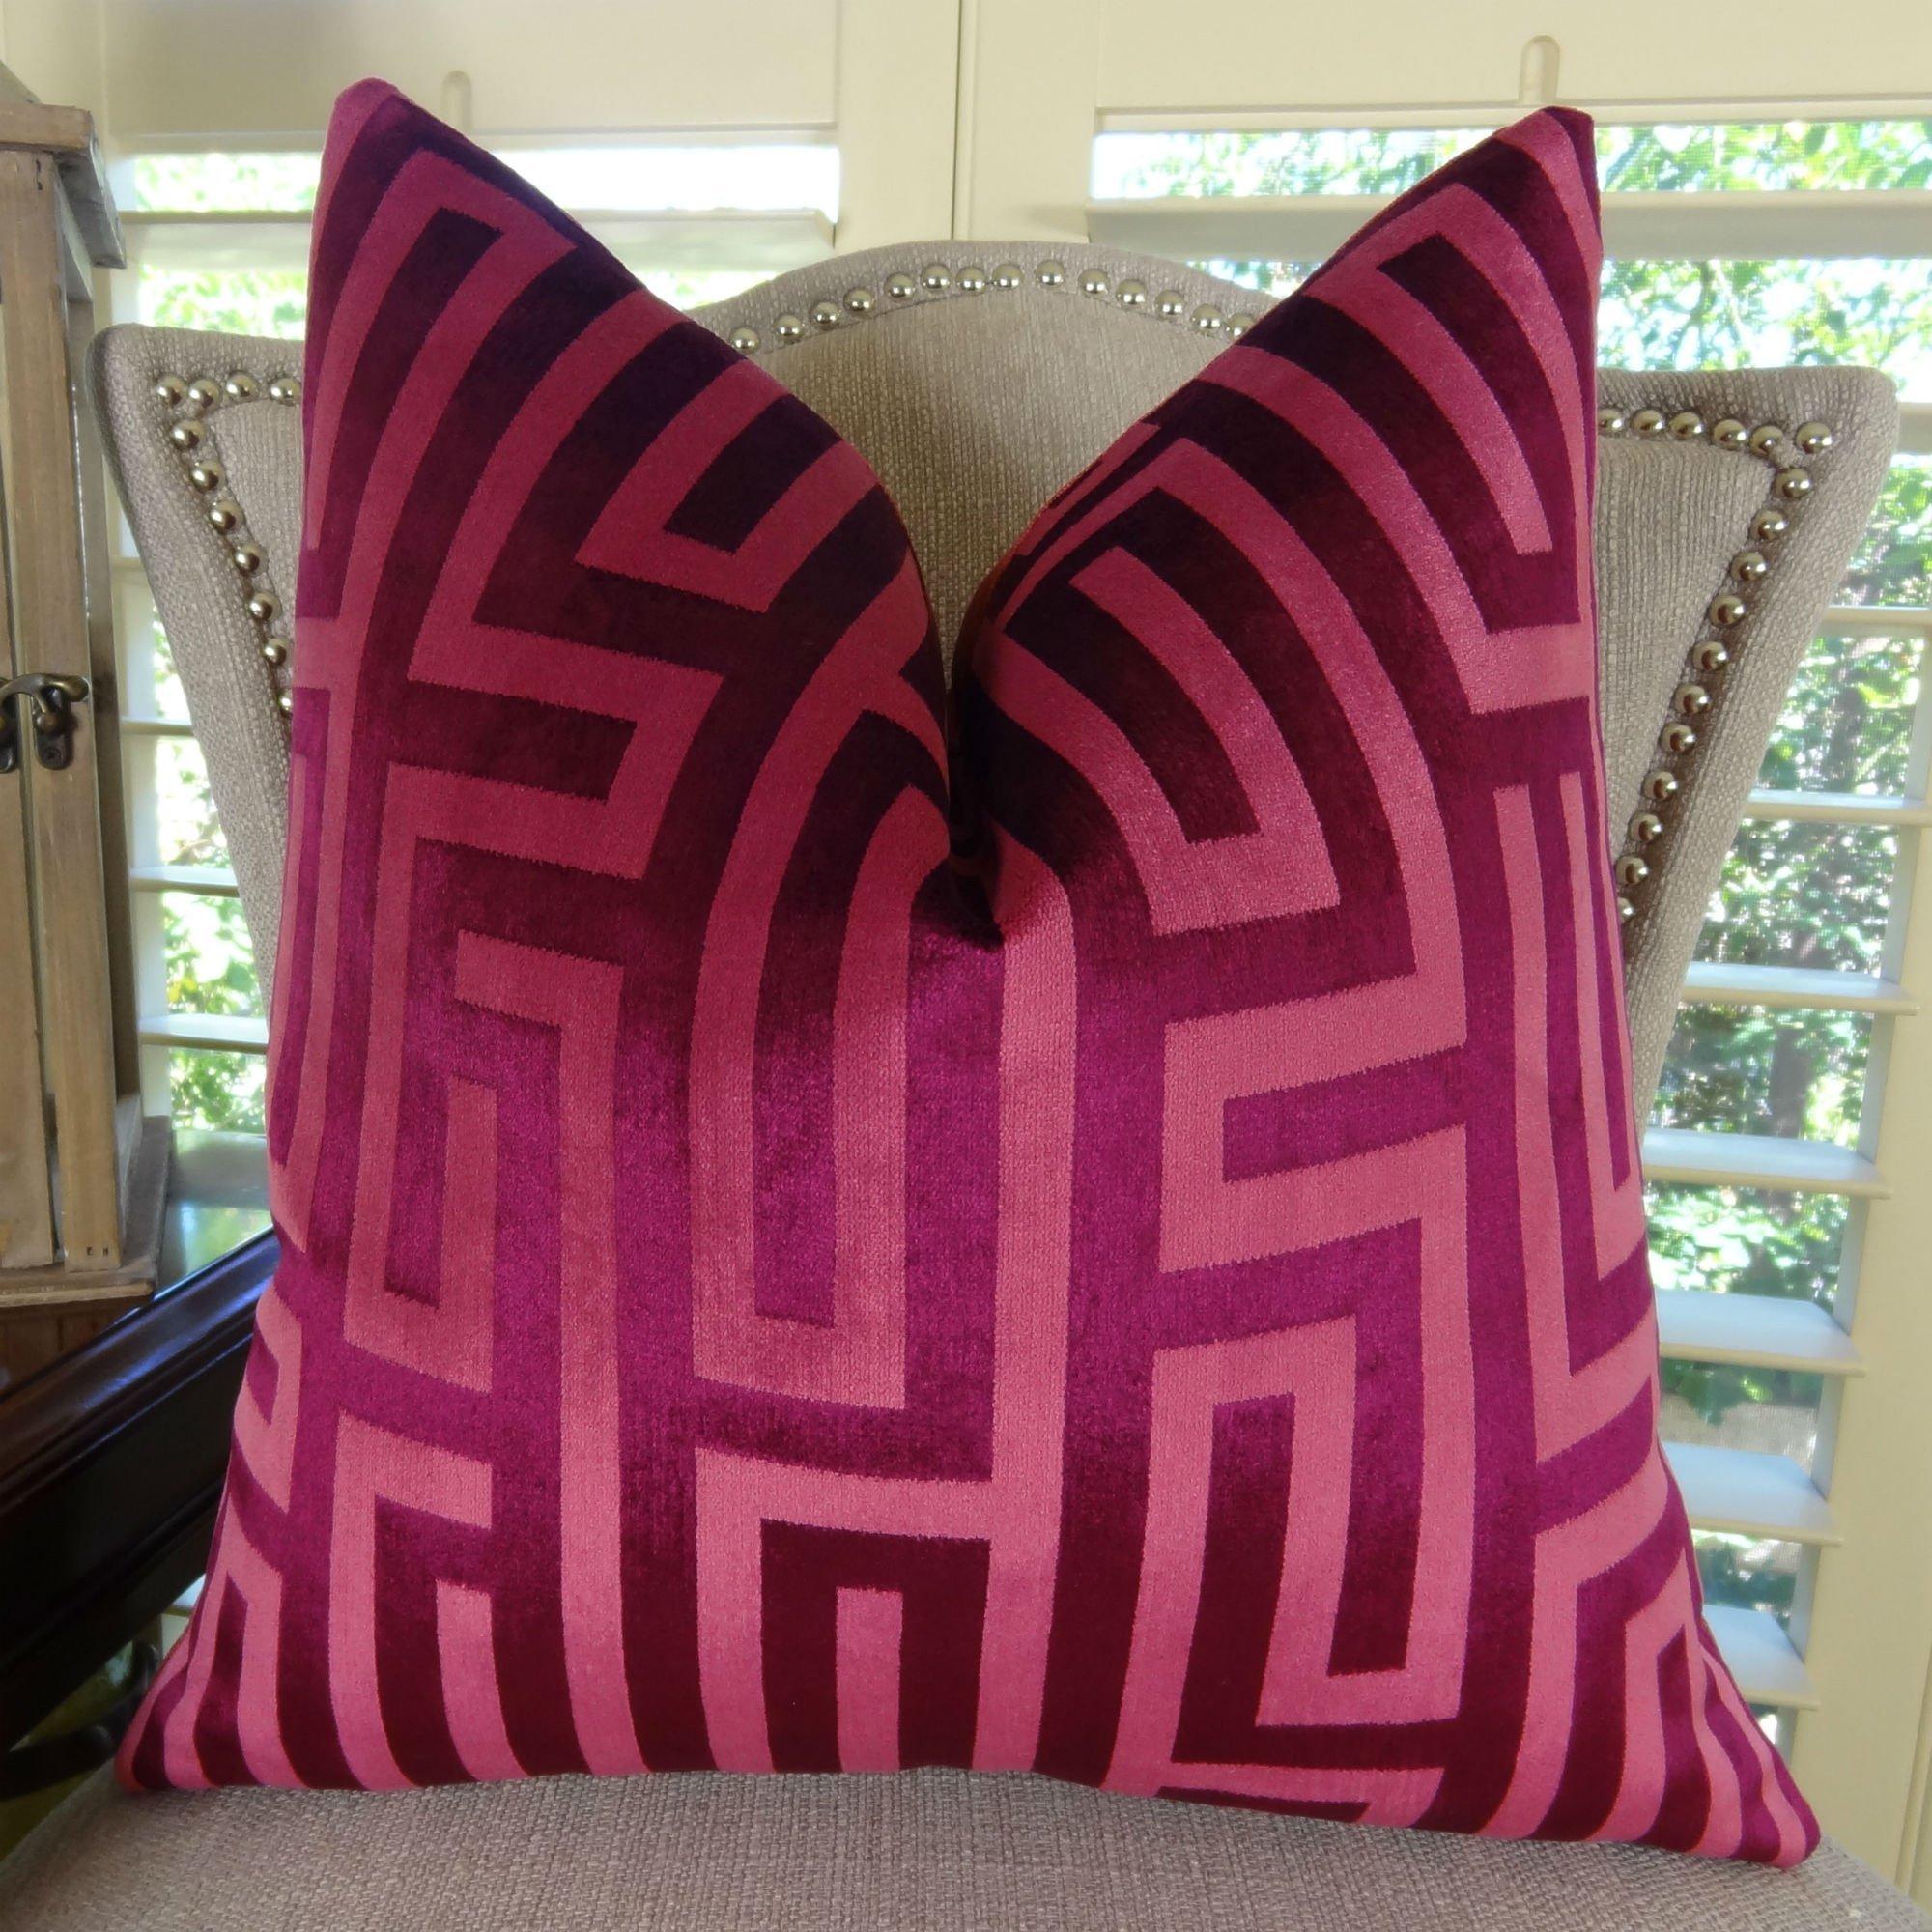 Thomas Collection Luxury Throw Pillow, Fuschia Greek Key Trellis Pattern Pillow, Geometric Pillow, Fuschia Throw Pillow, Hollywood Regency, INCLUDES POLYFILL INSERT, Handmade in USA, 11193